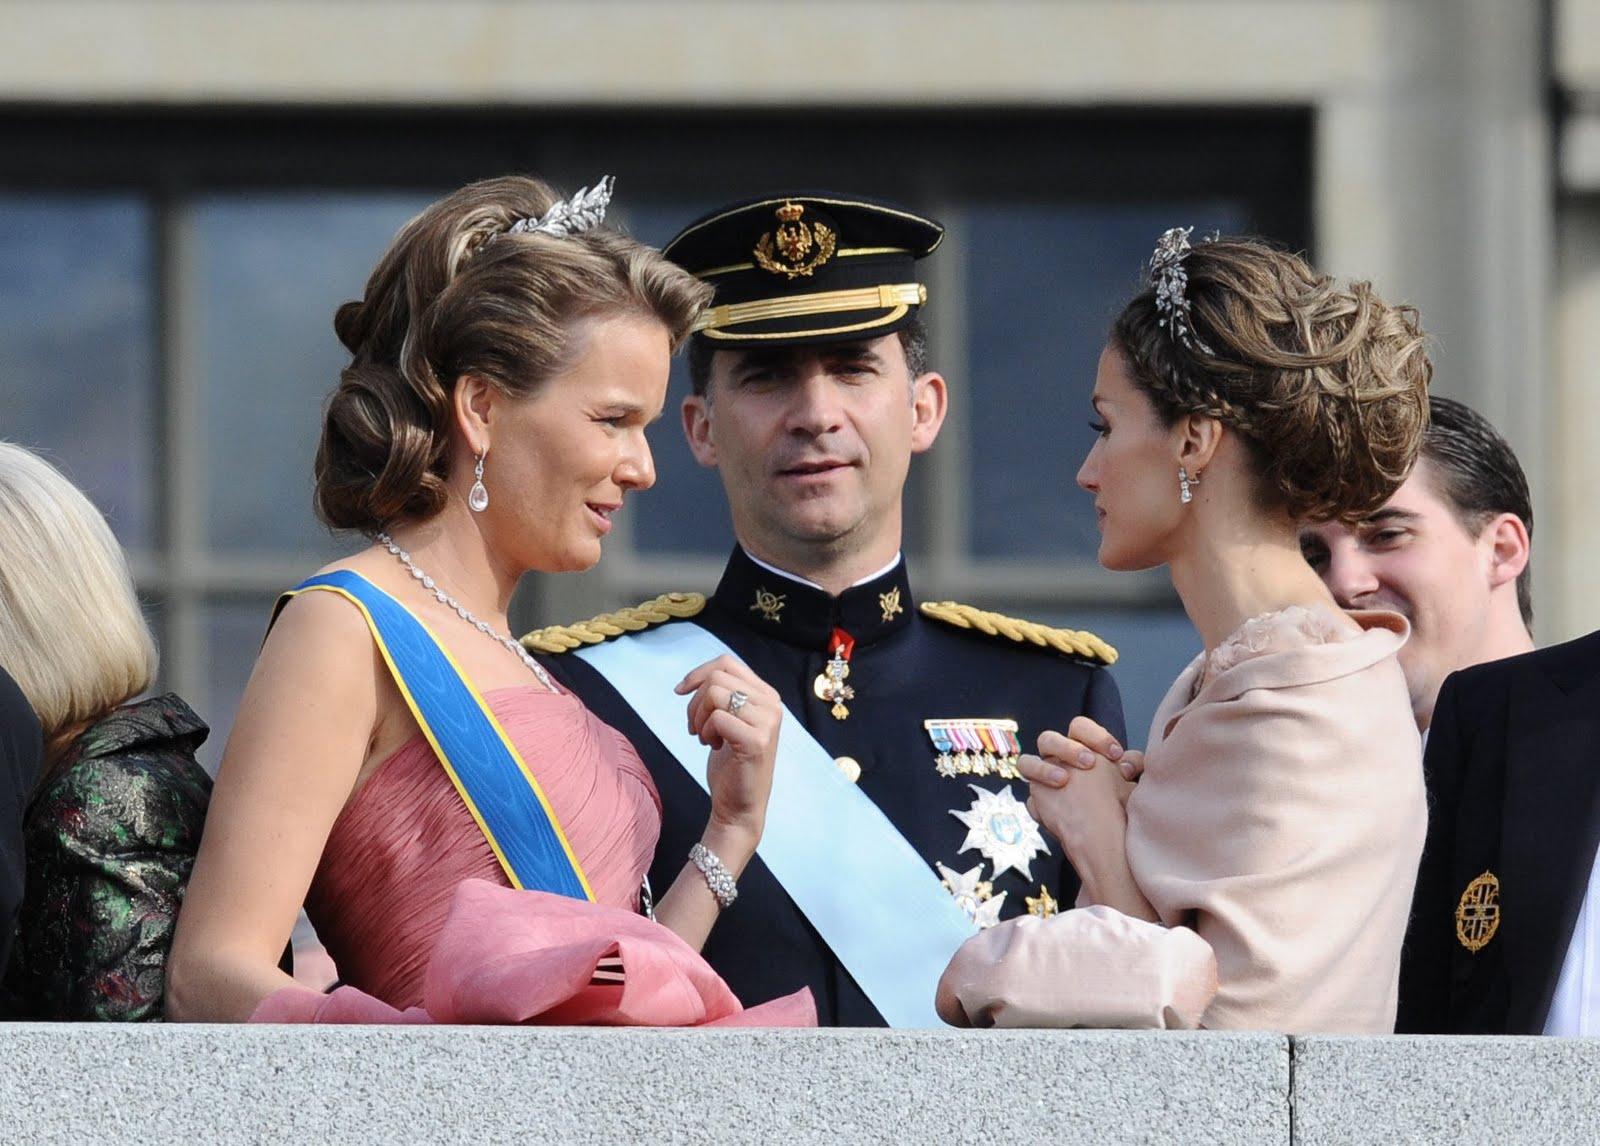 37714-by-mah0ne-princess-letizia-at-the-wedding-of.jpg